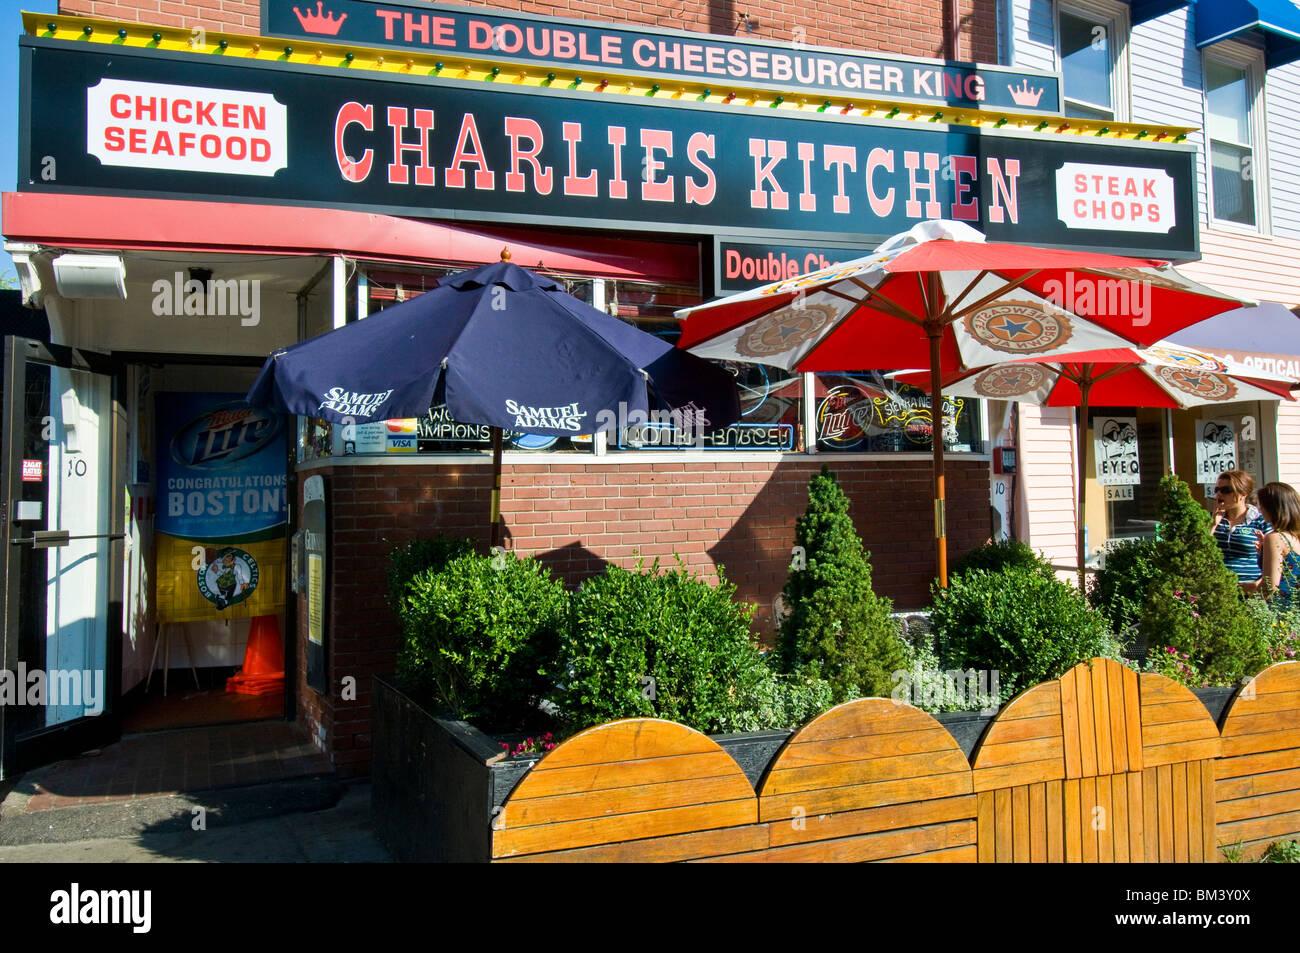 charlies kitchen famous restaurant cambridge - Charlies Kitchen